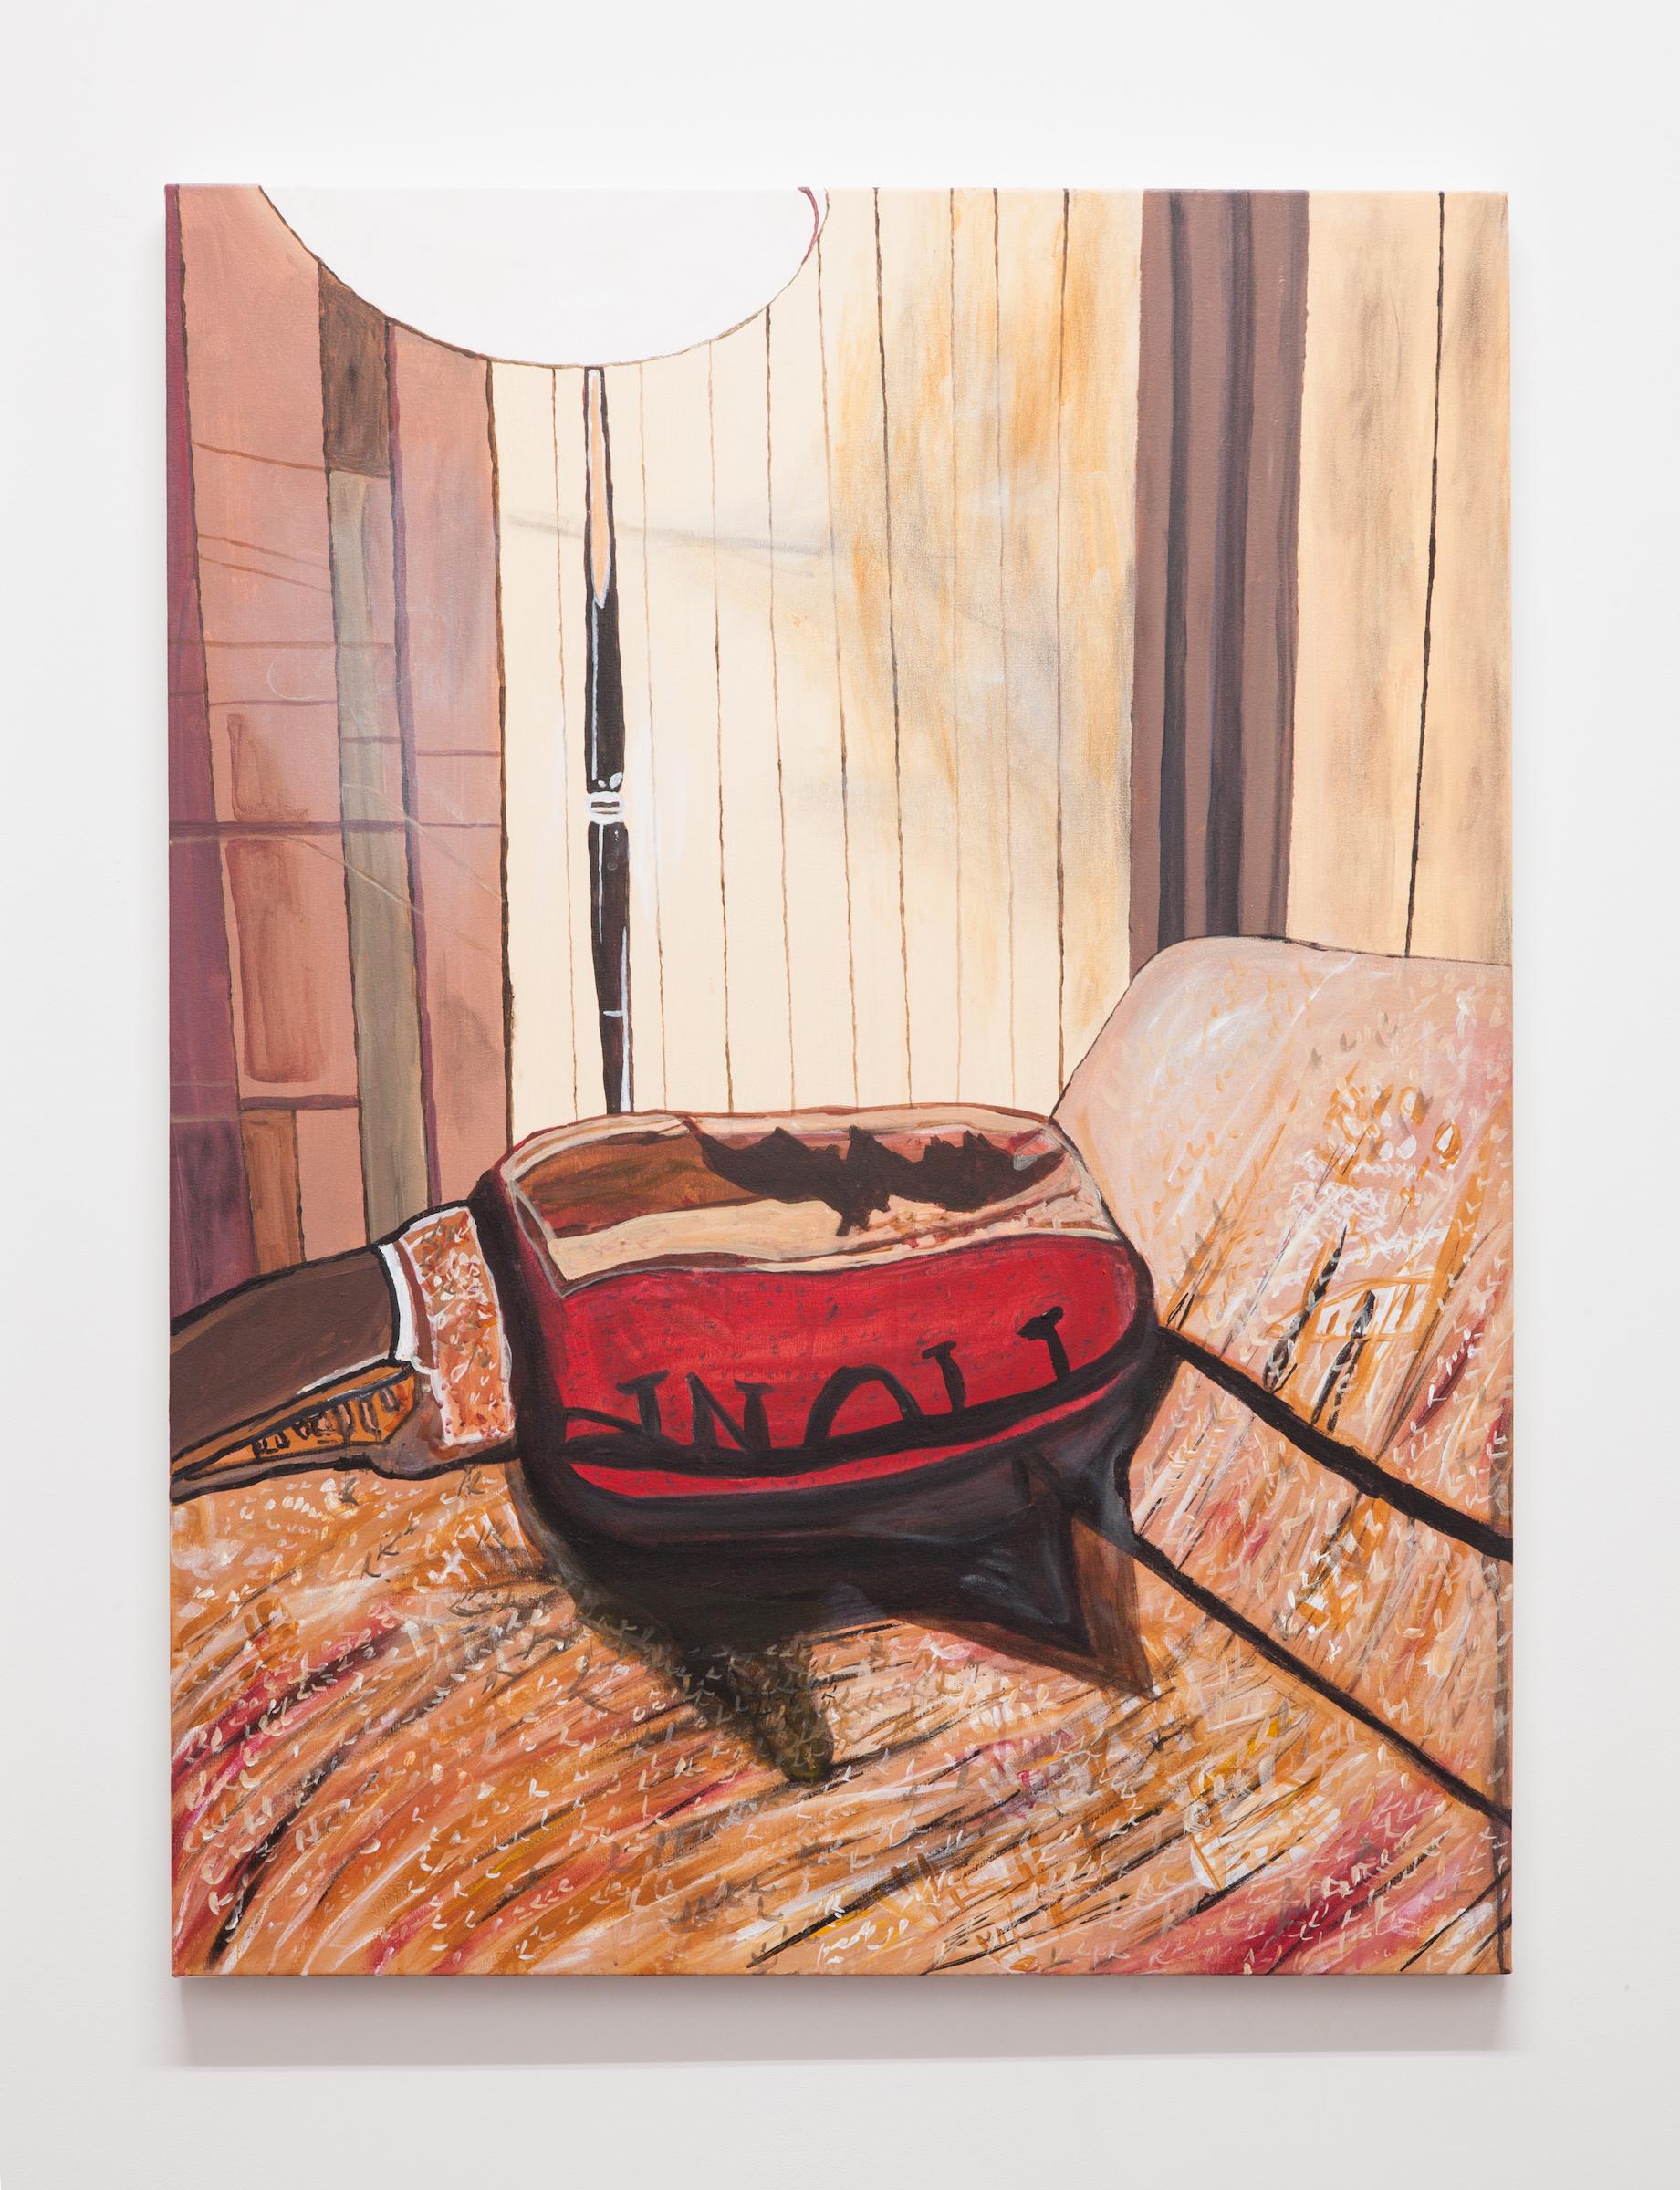 Jocko Weyland, Blanket ,2014,acrylic on canvas,48 x 36 in